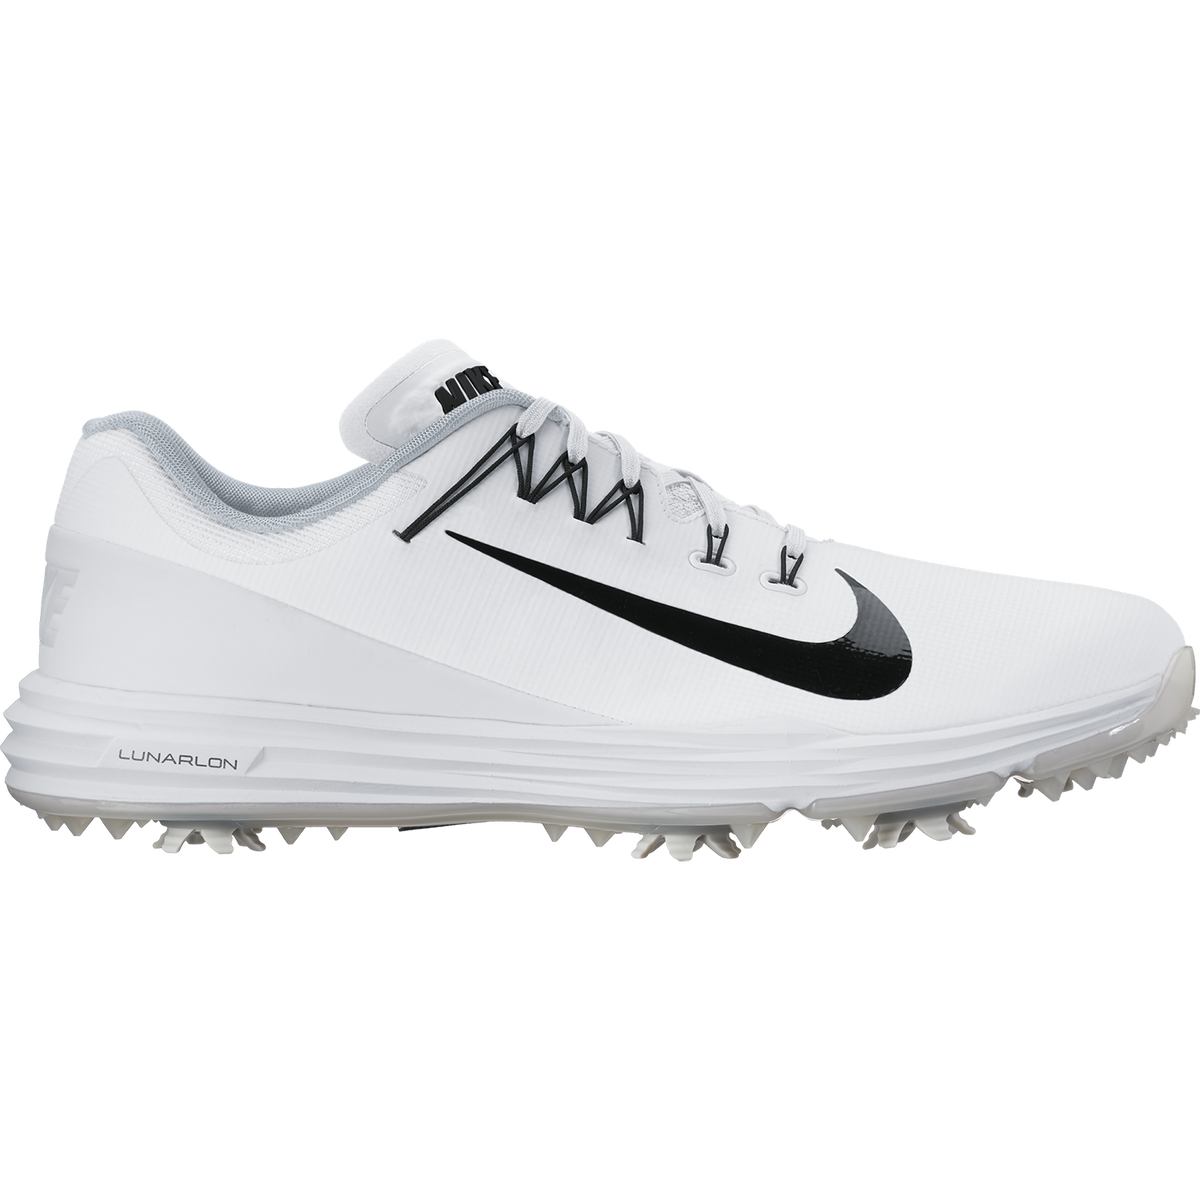 ee4f12fa1f33 Nike Lunar Command 2 Men s Golf Shoe - White Black